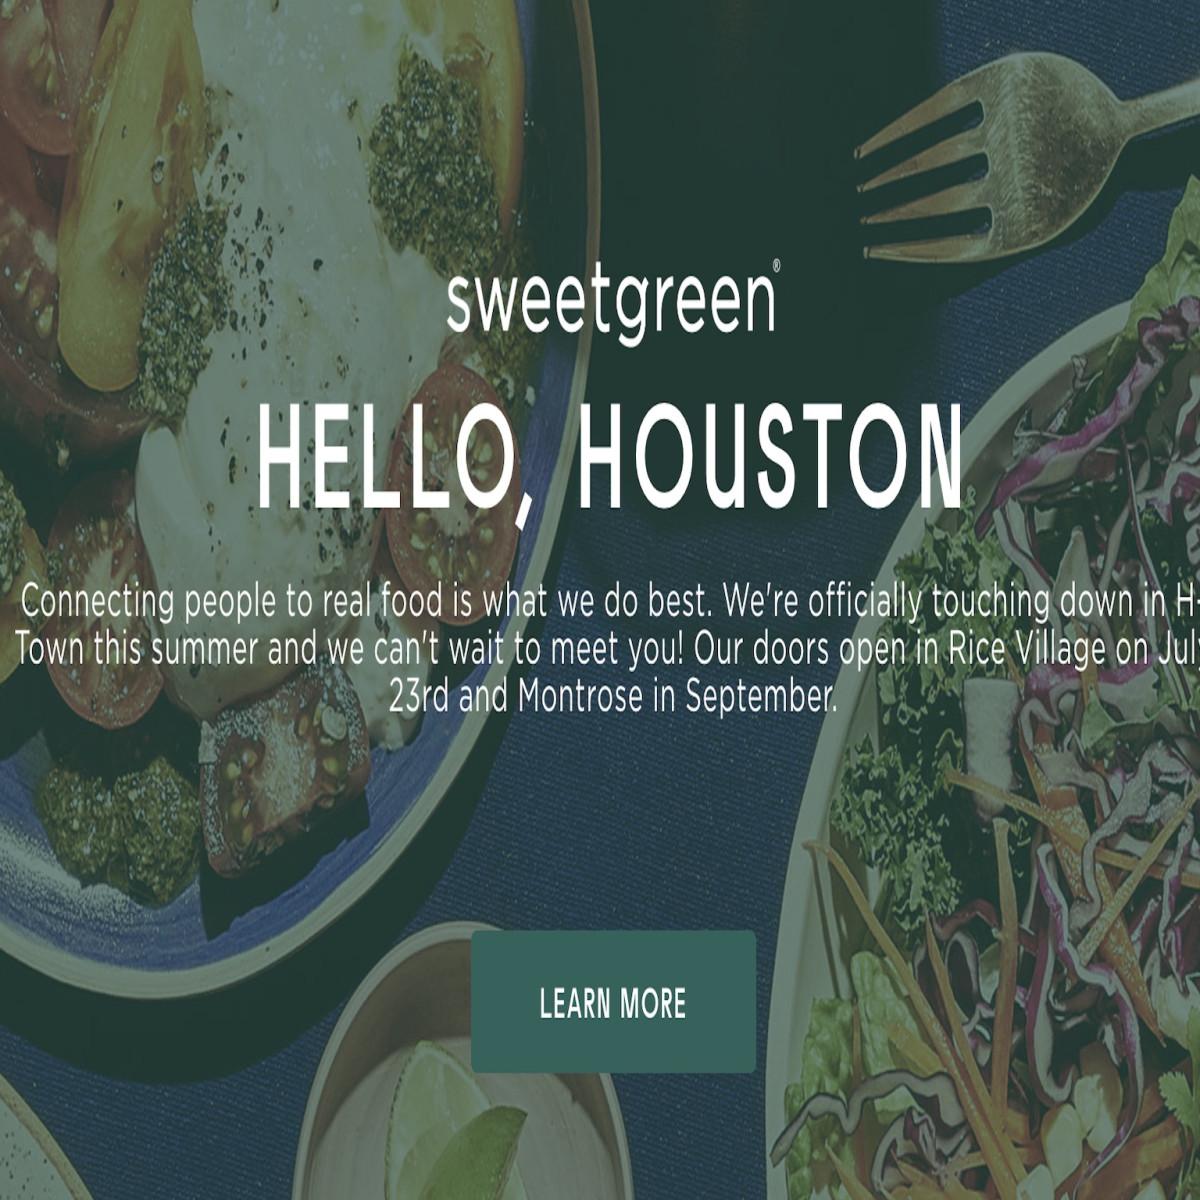 Sweetgreen opening date screen capture